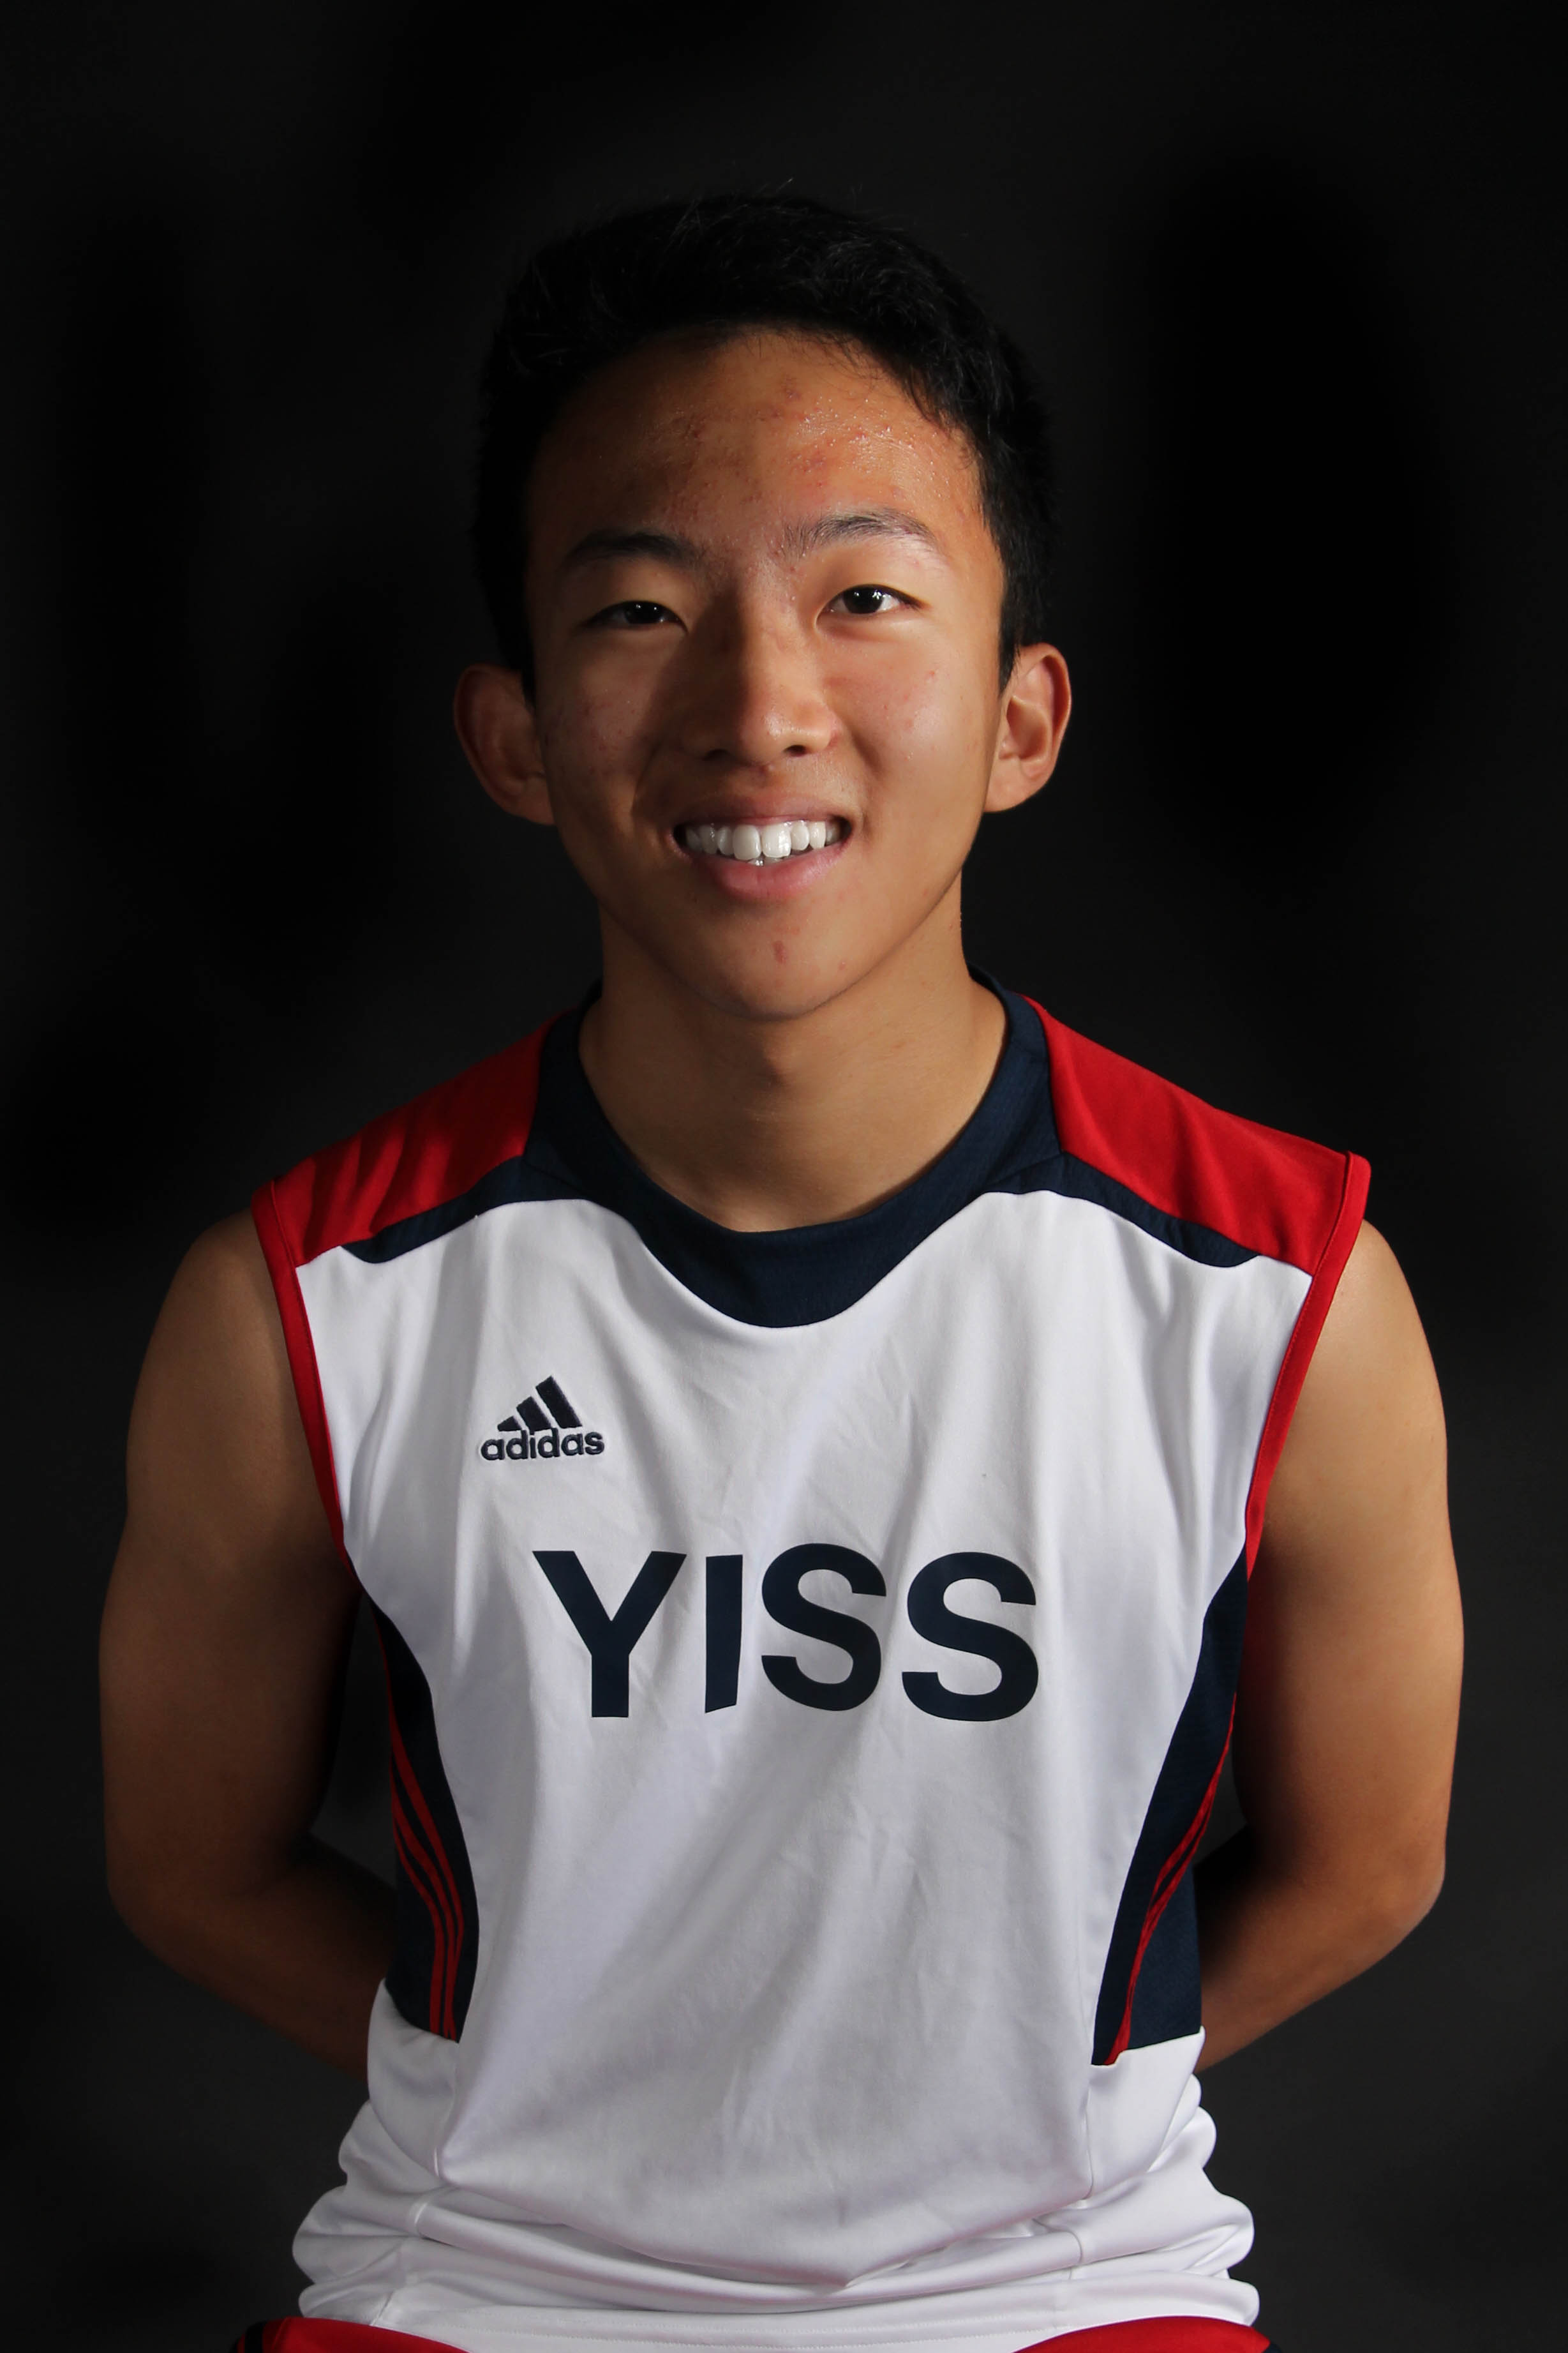 Varsity Boys Volleyball 2017 18 Yisspn